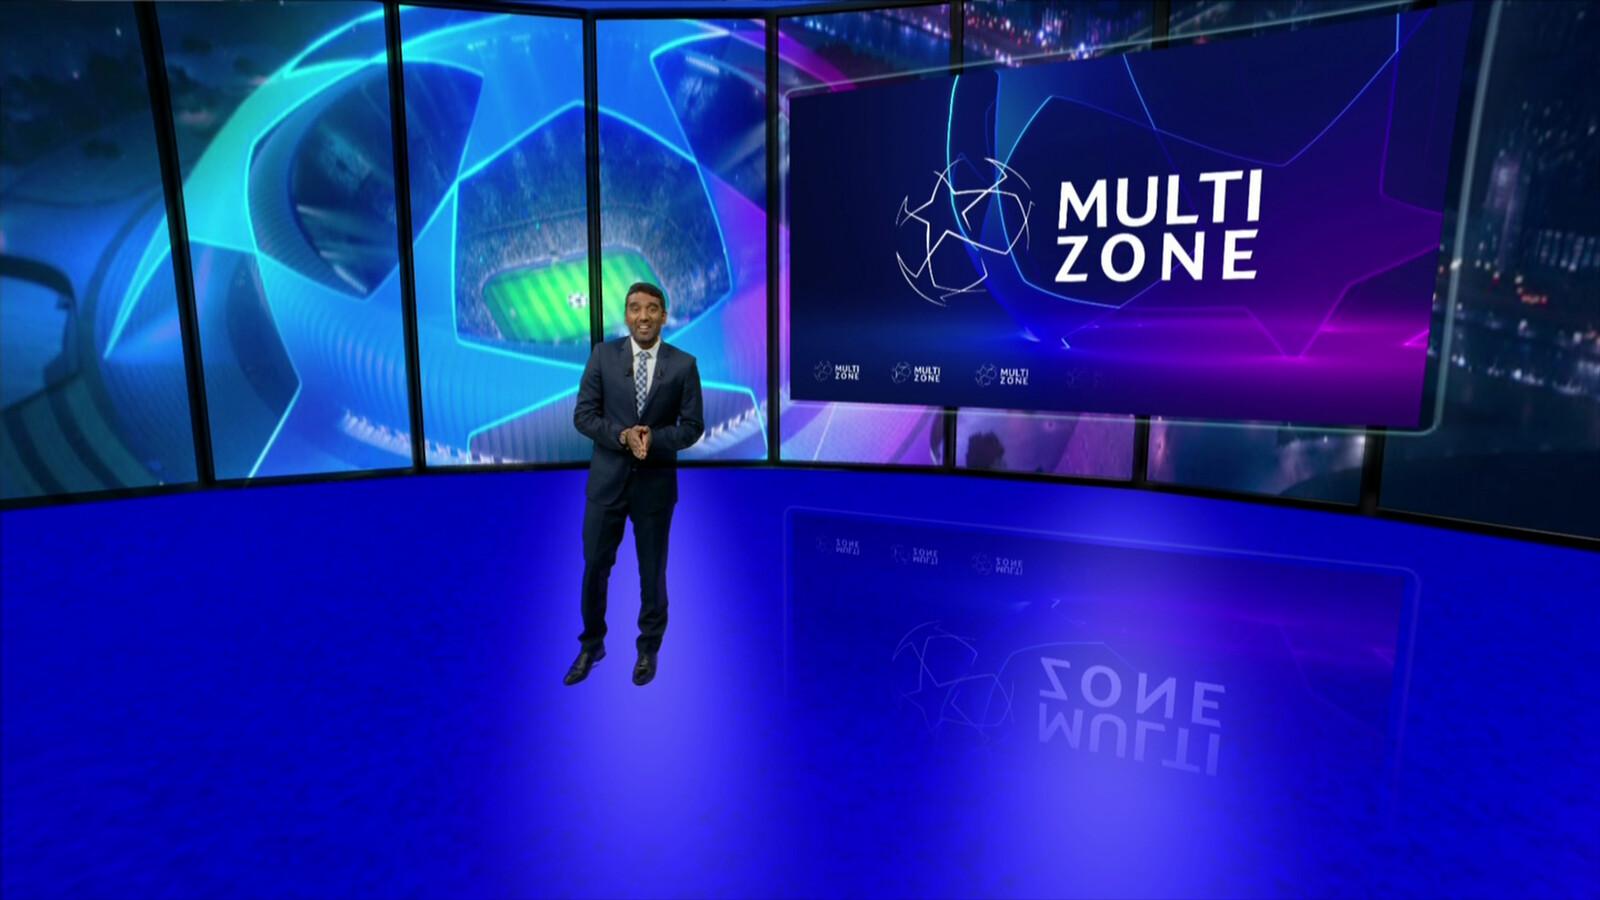 UCL VIRTUAL SET // RMC SPORT MULTIZONE